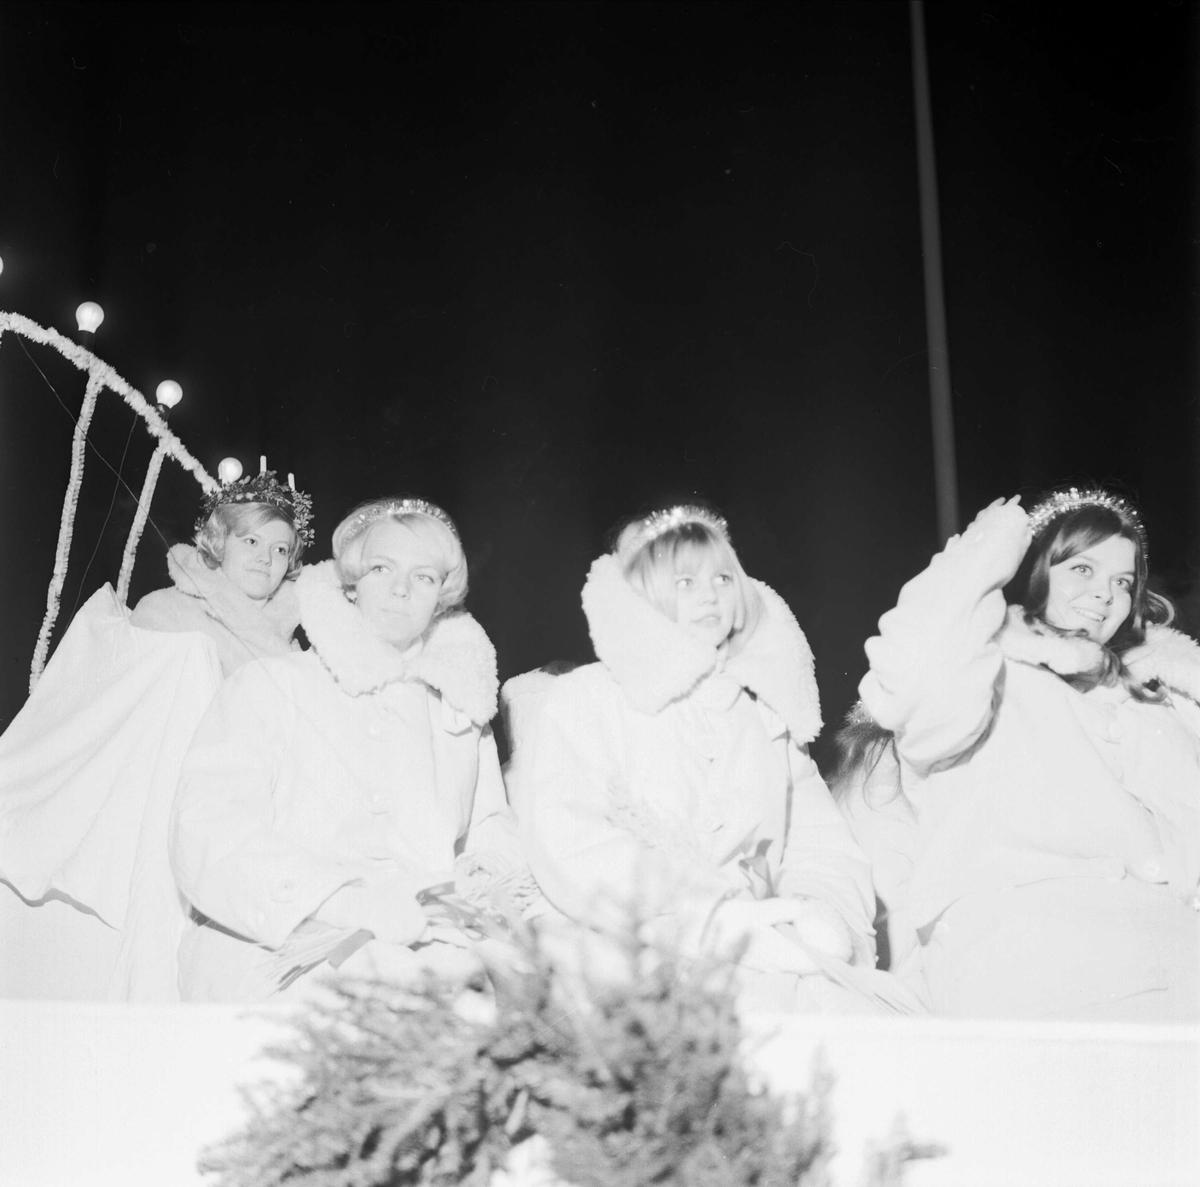 Tierps lucia, Tierp, Uppland december 1967